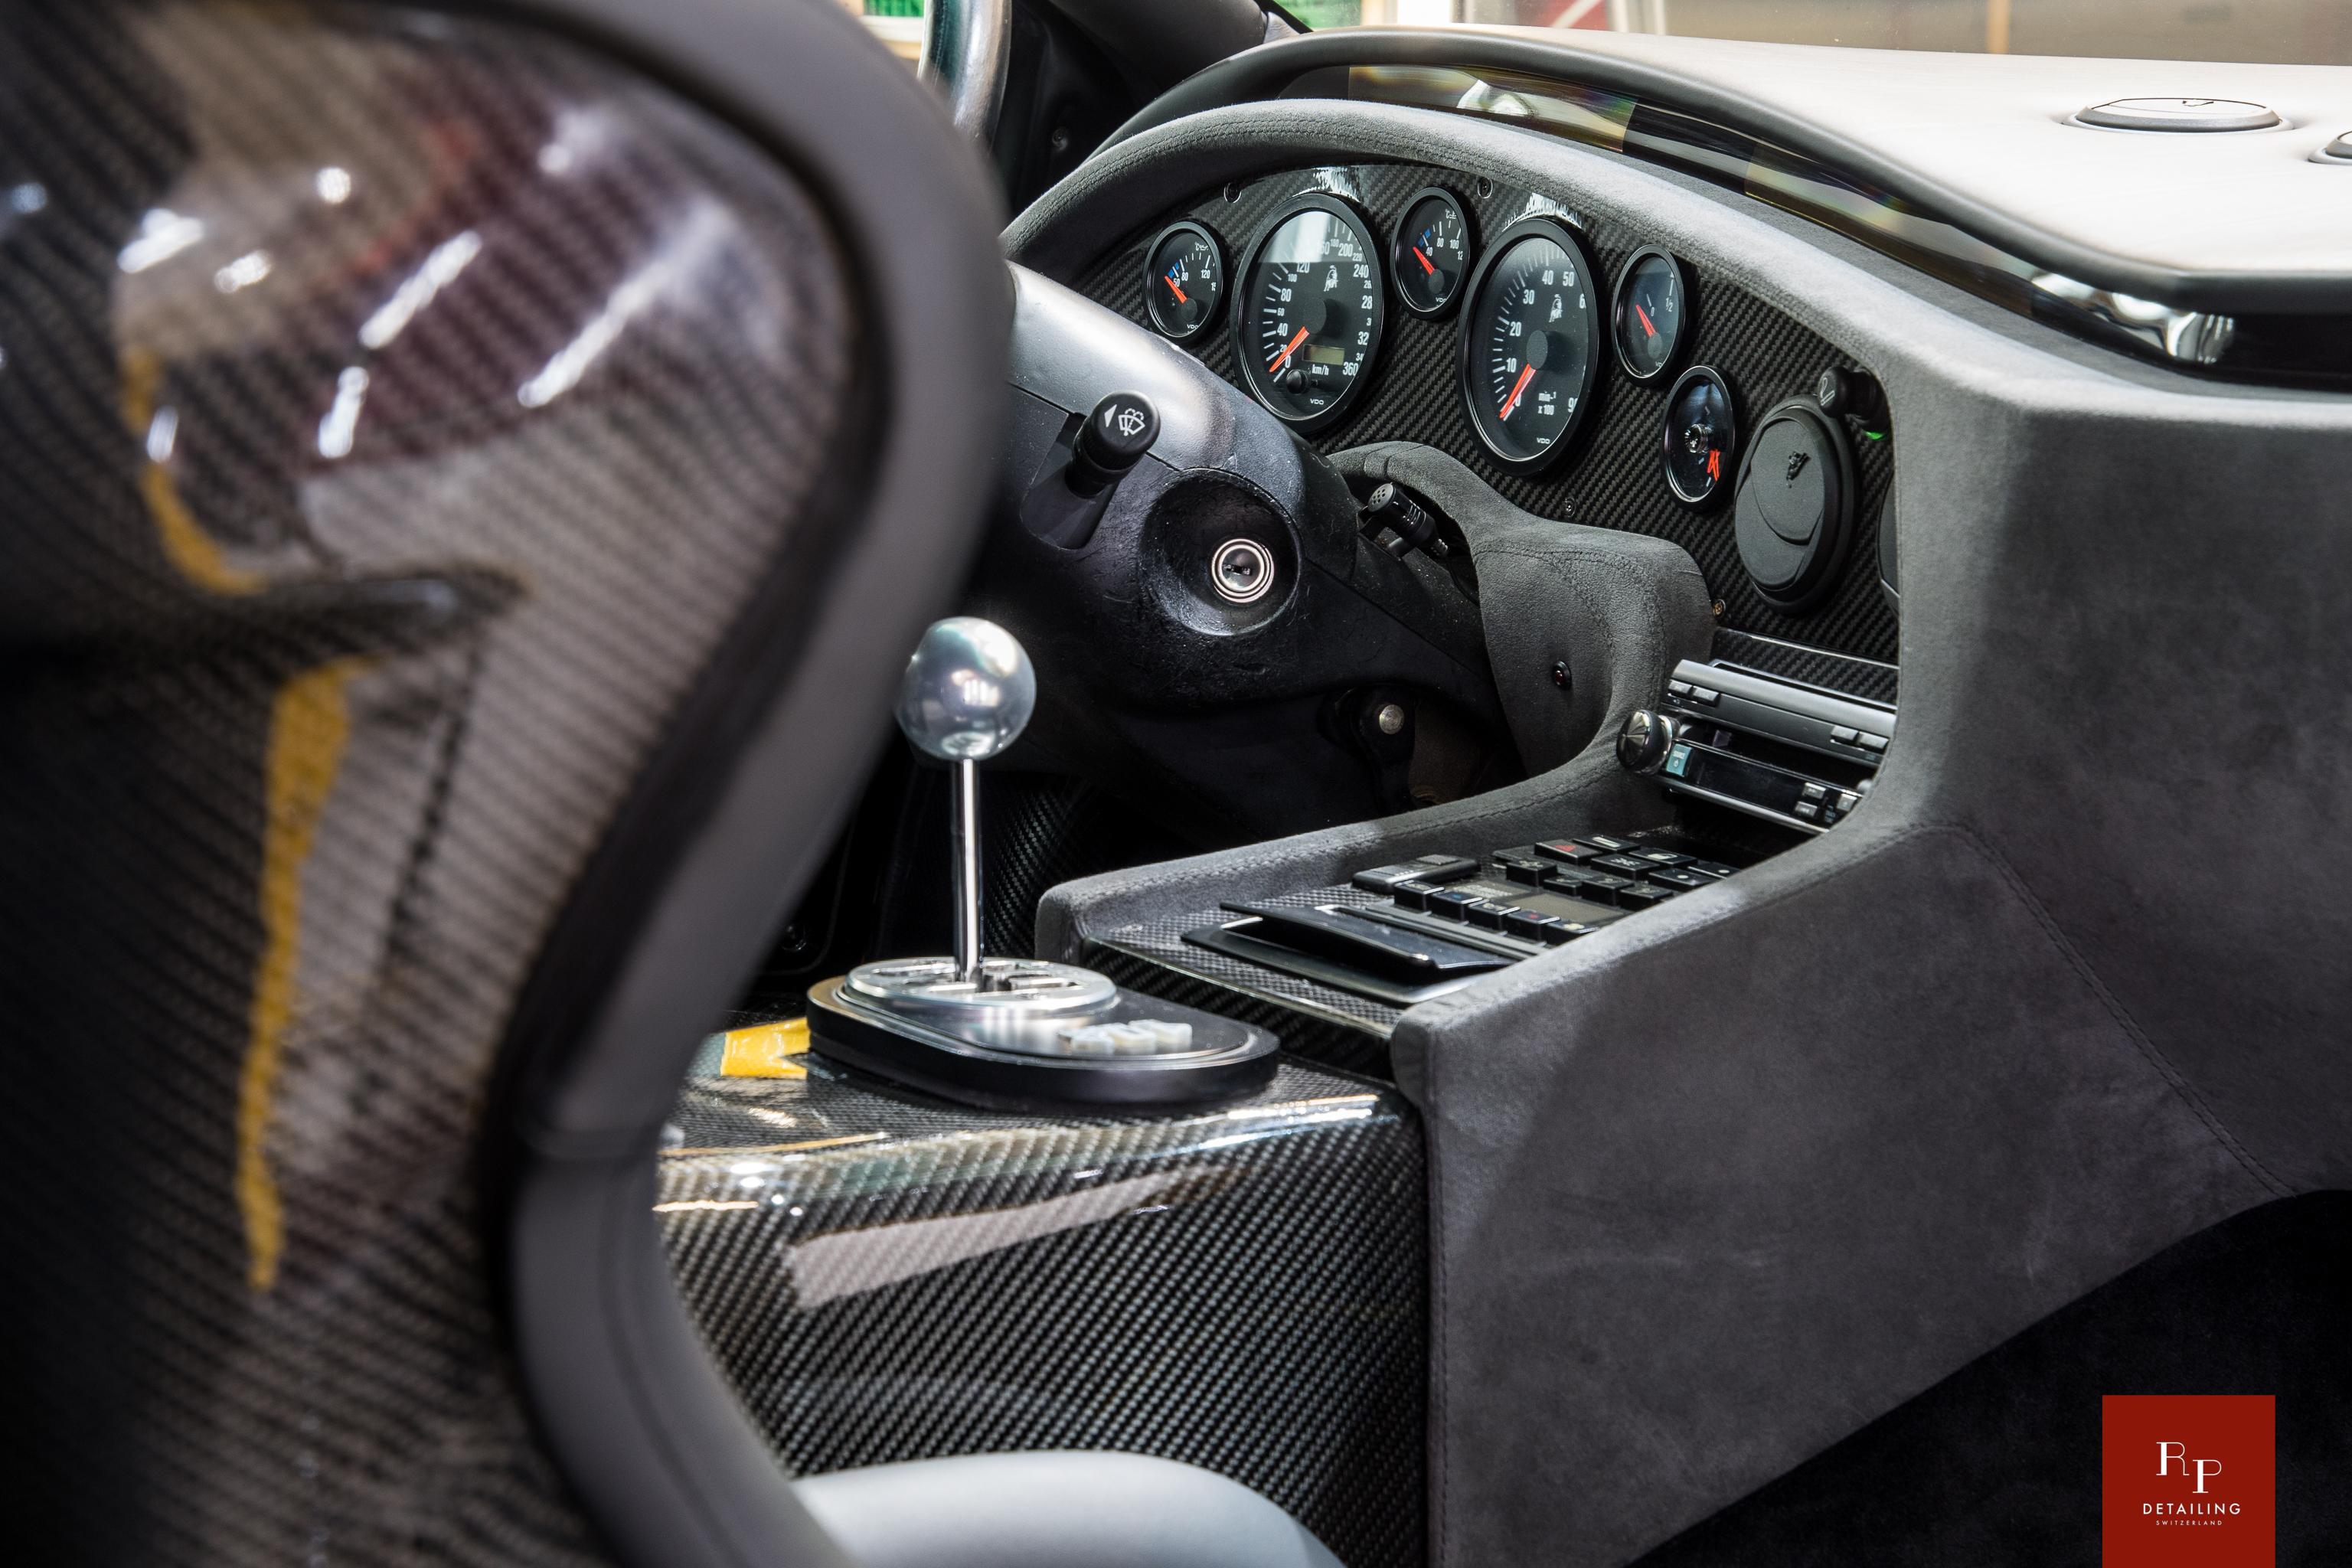 Lamborghini%20Diablo%20GT%20RP%2023.jpg